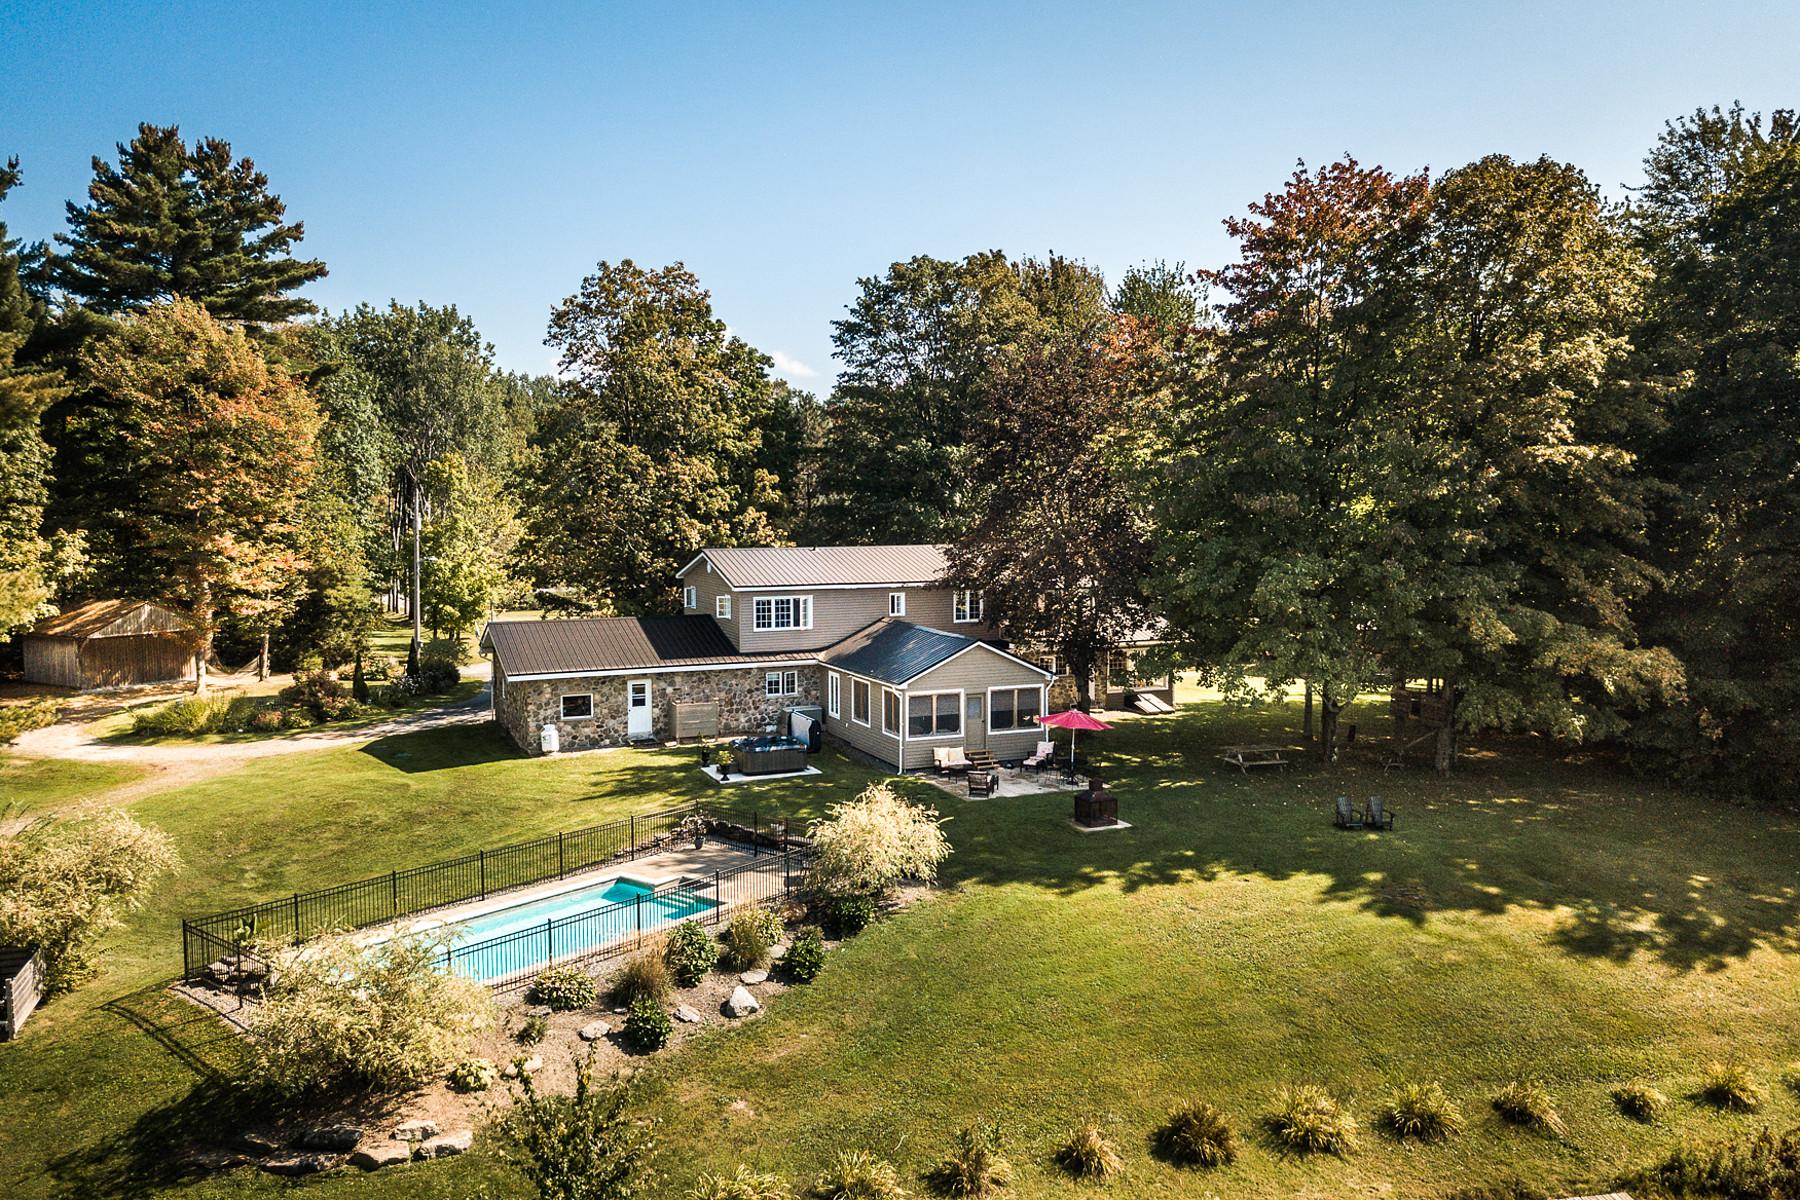 Single Family Home for Sale at Dunham, Montérégie 4762 Ch. Godbout Dunham, Quebec, J0E1N0 Canada